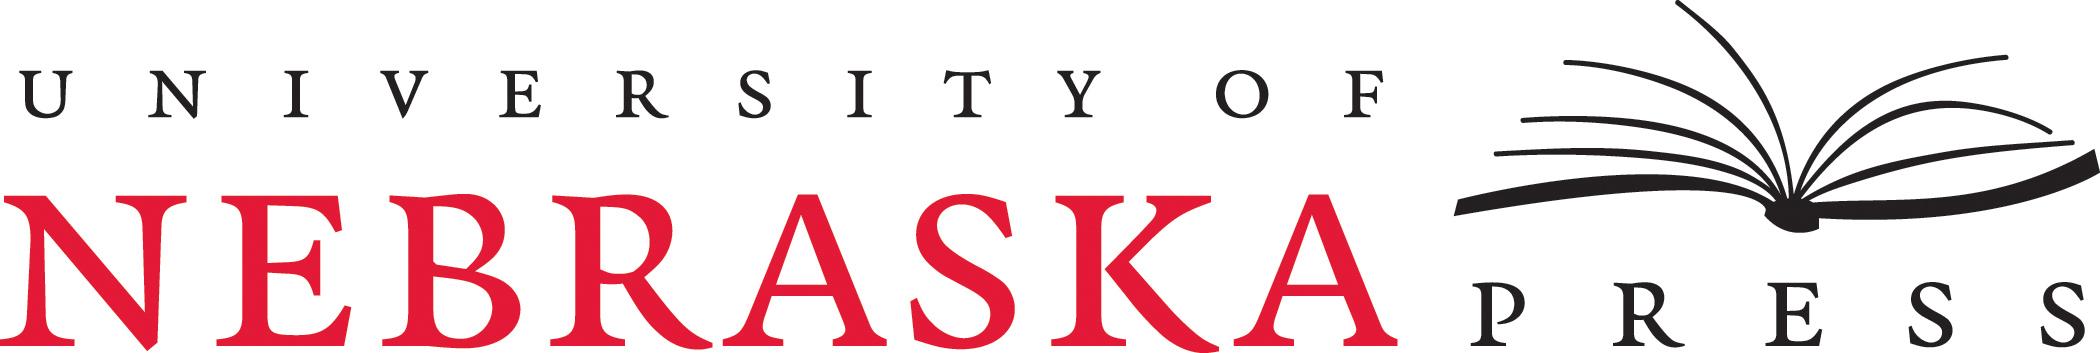 <p>University of Nebraska</p>